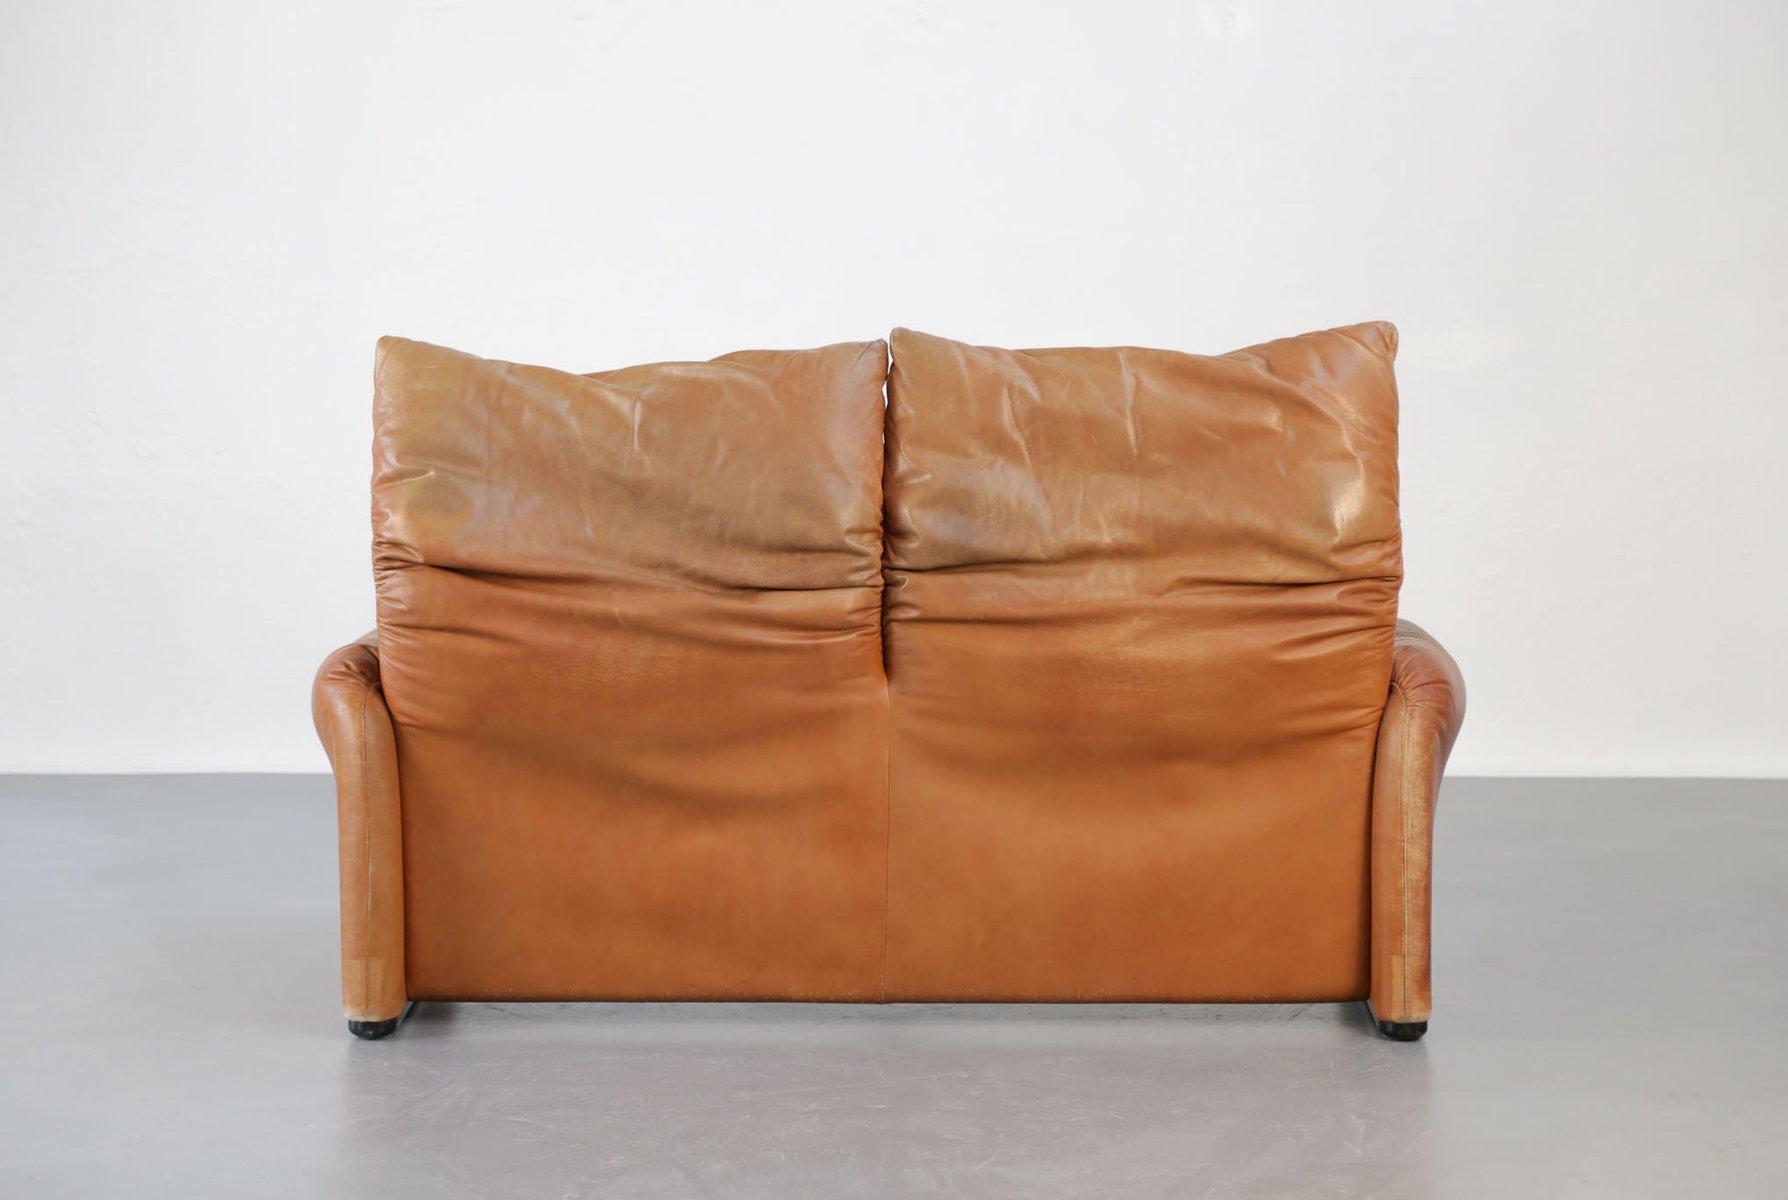 vintage maralunga sofa von vico magistretti f r cassina. Black Bedroom Furniture Sets. Home Design Ideas